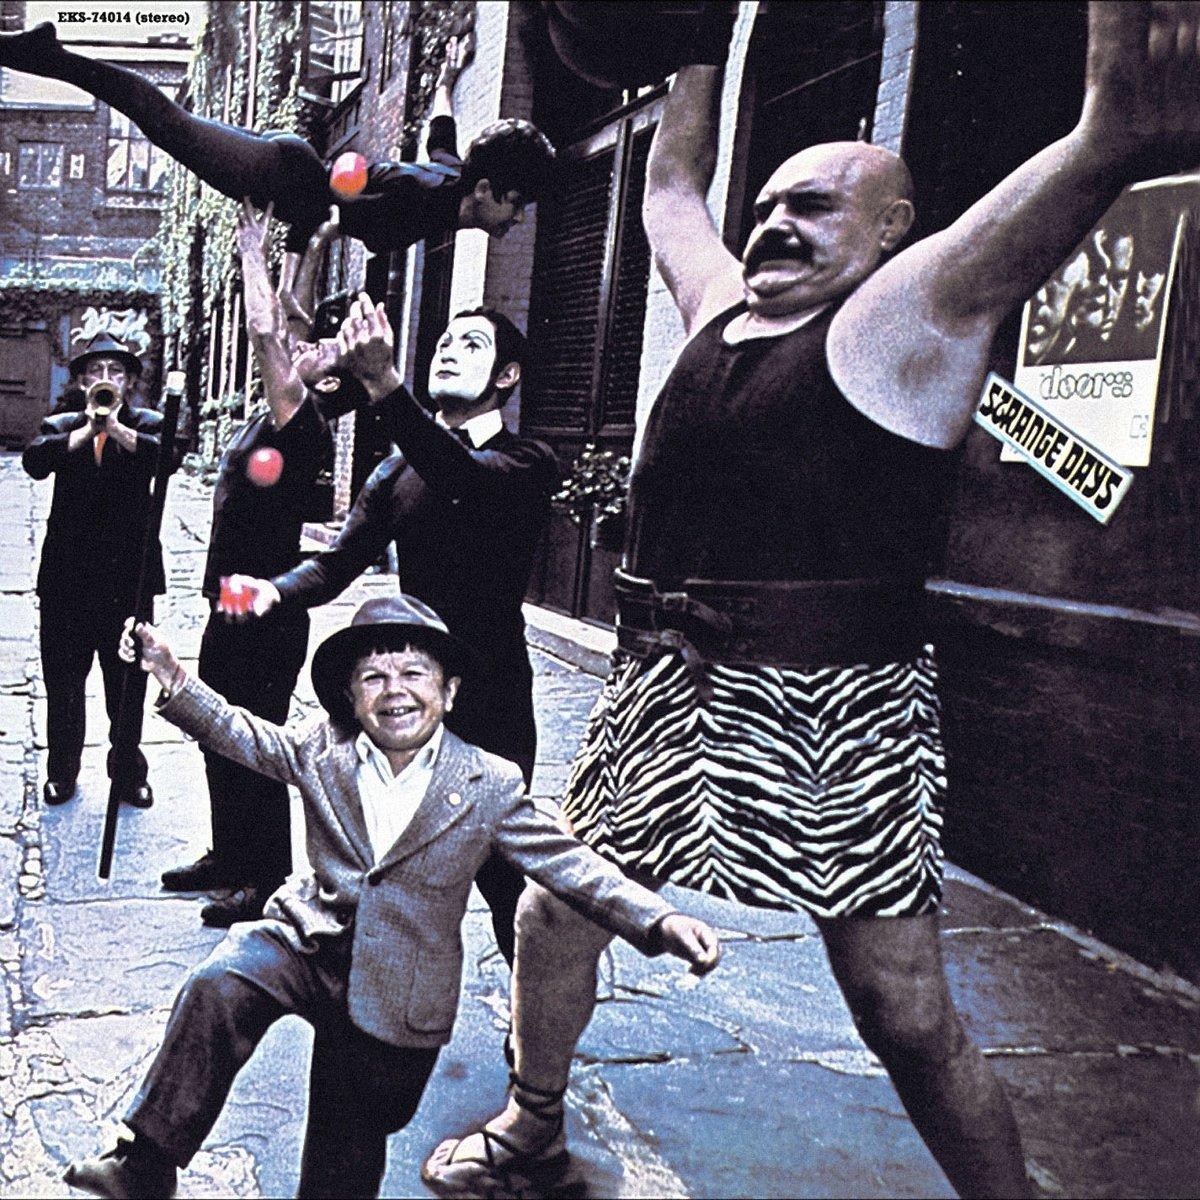 sc 1 st  Amazon.com & The Doors - Strange Days (180 Gram Vinyl) - Amazon.com Music